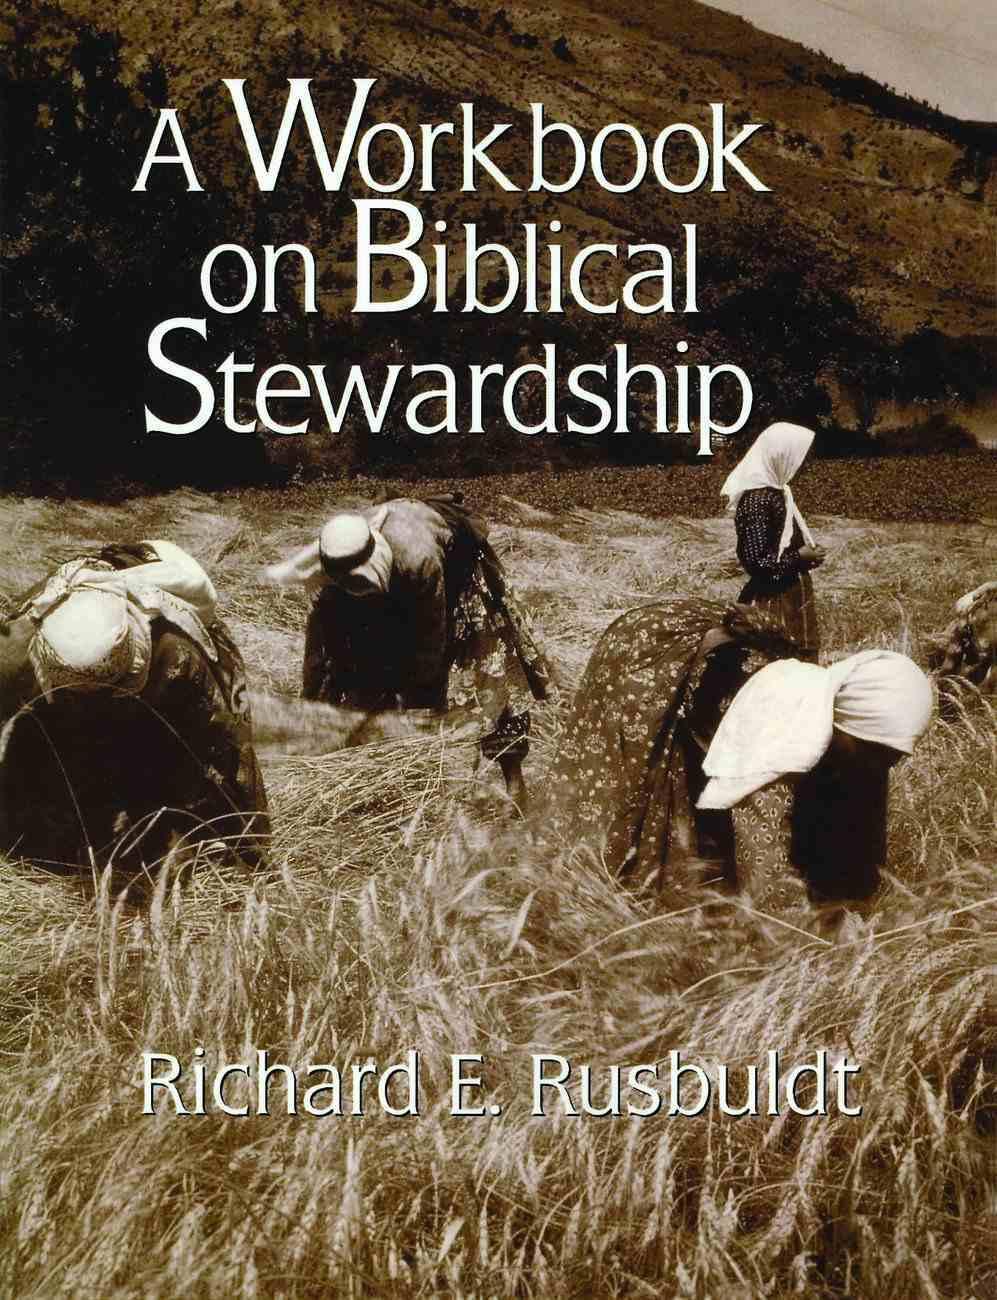 Workbook on Biblical Stewardship Paperback